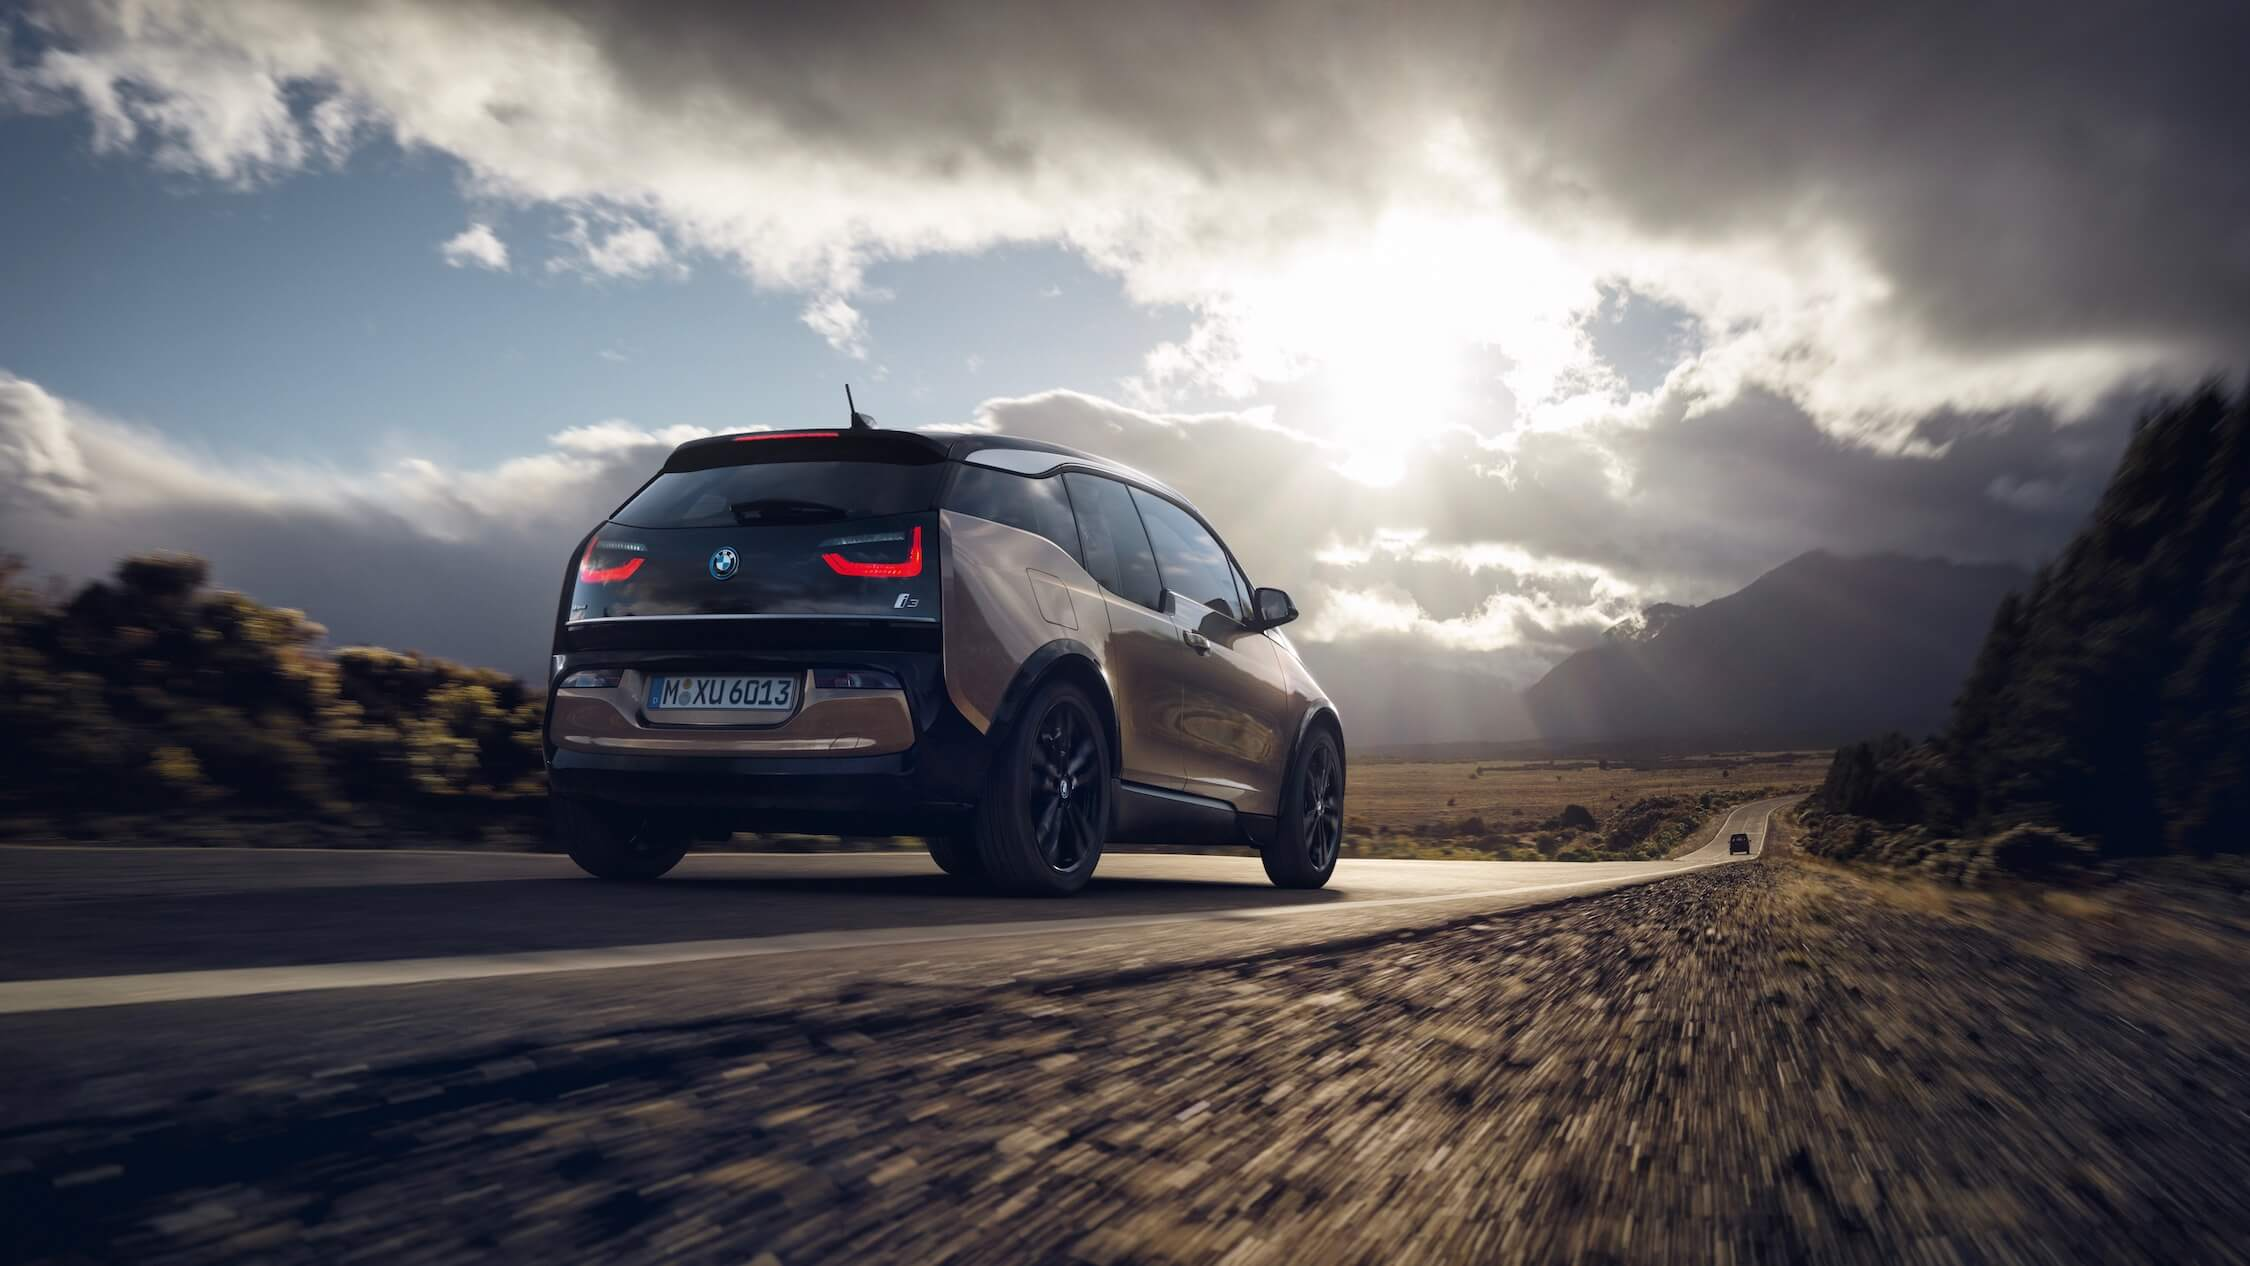 BMW i3 elektrische auto